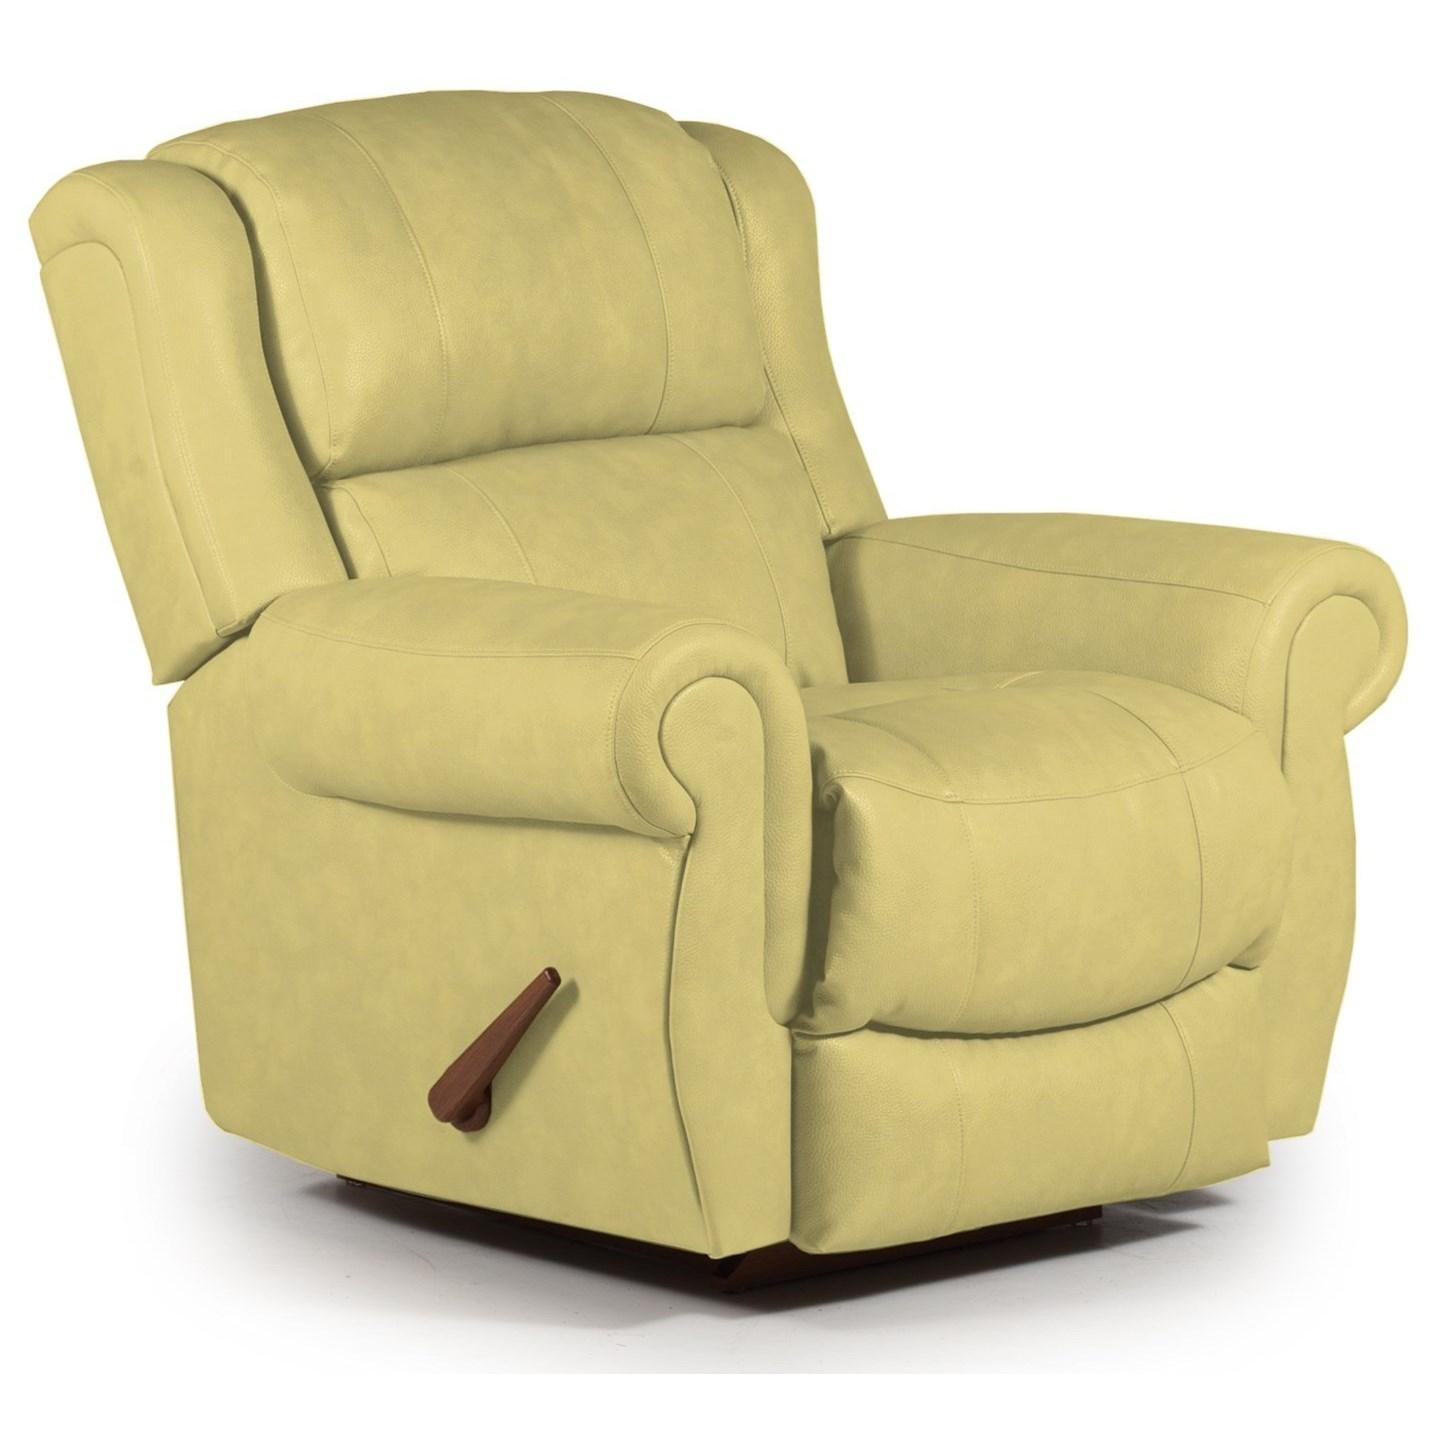 Best Home Furnishings Recliners - Medium Terrill Swivel Rocker Recliner - Item Number: -595658627-28595U